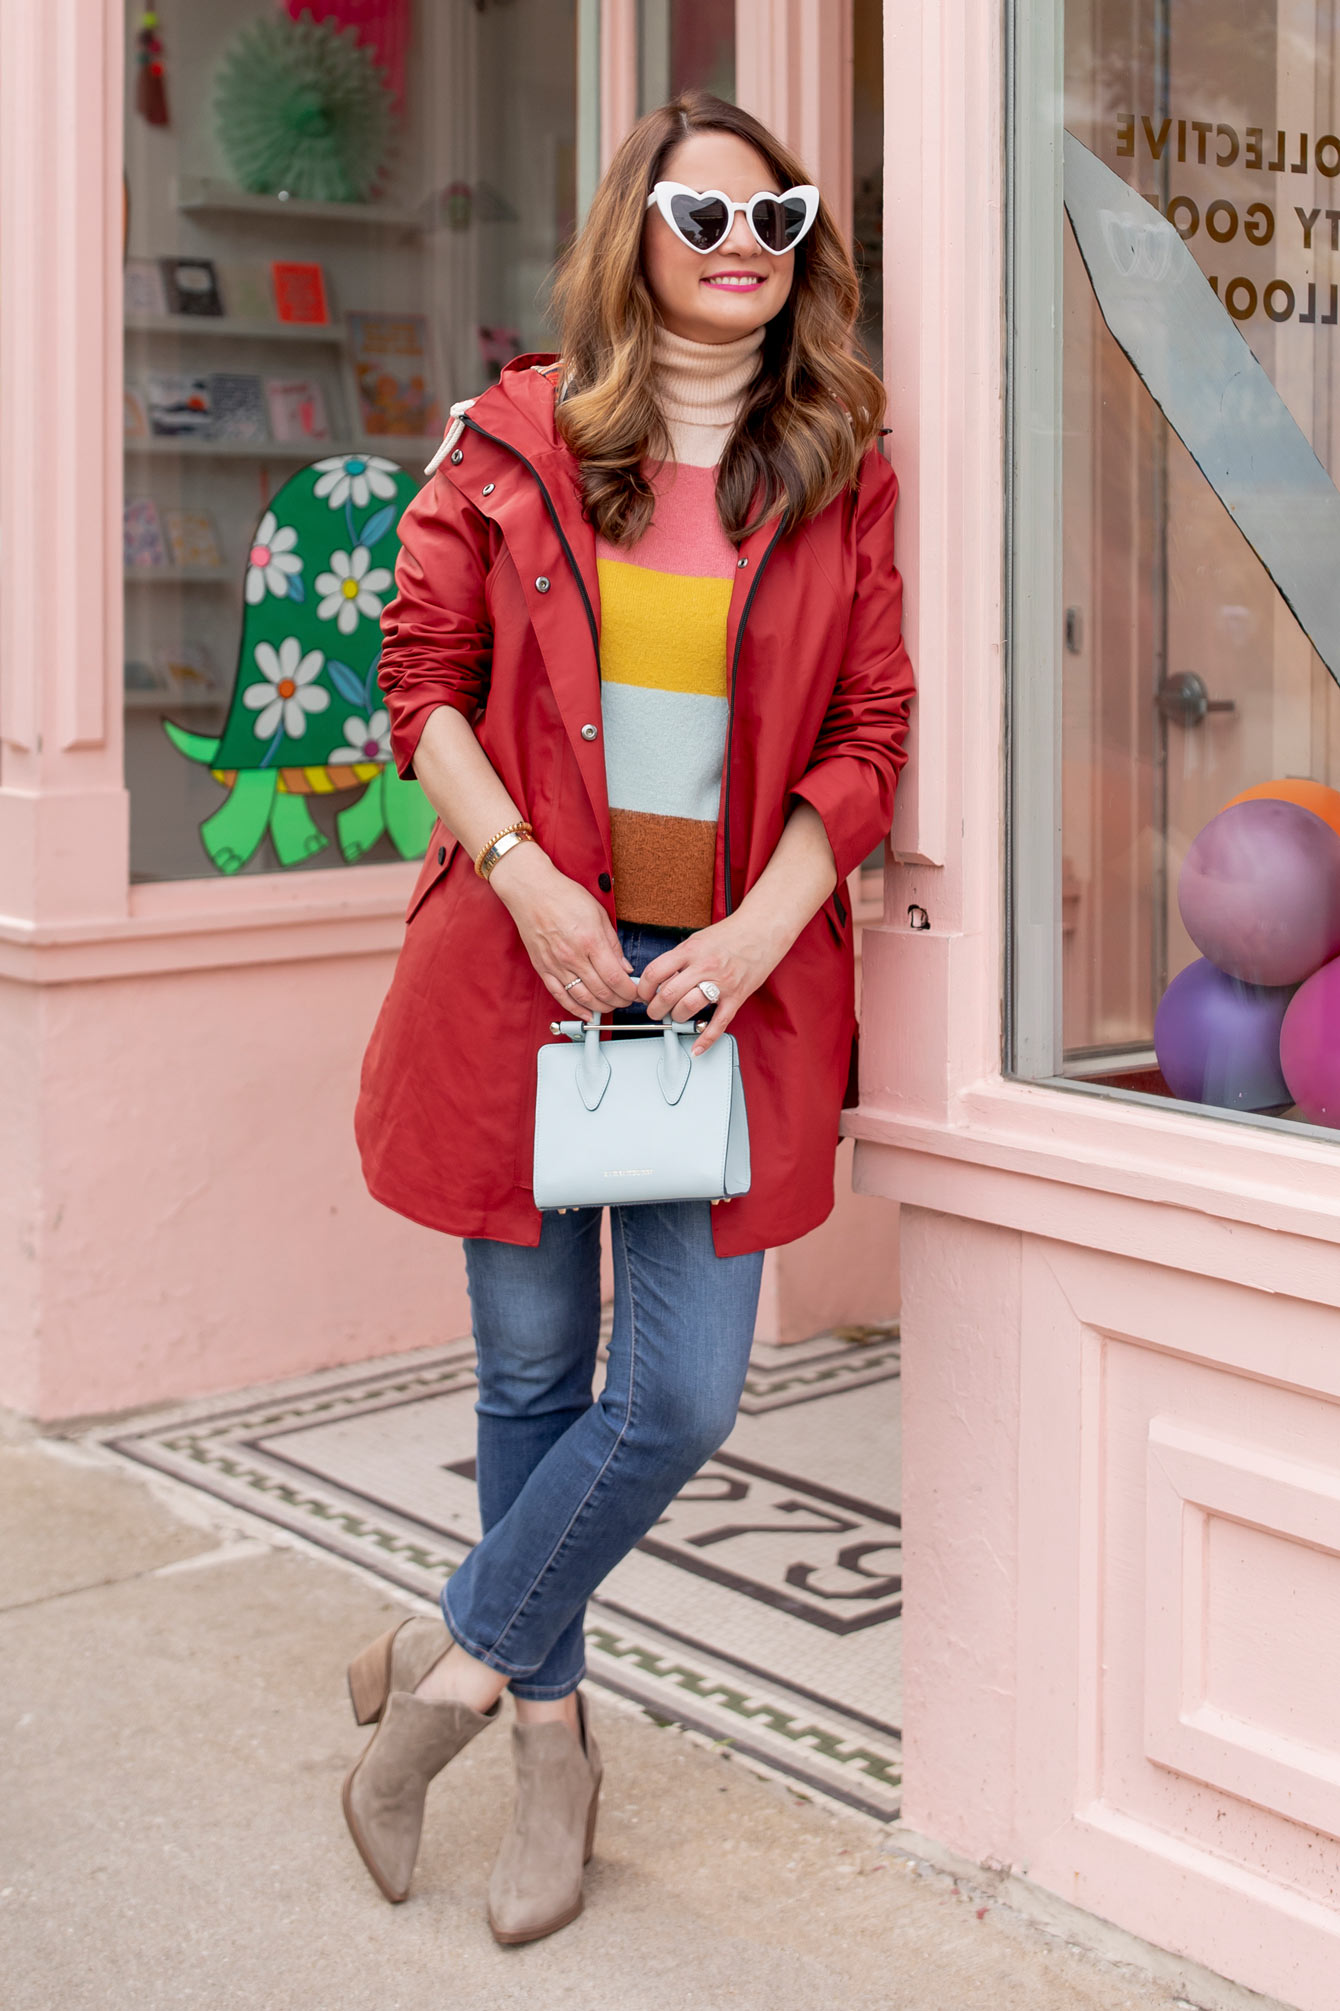 Pendleton Newport Hooded Red Raincoat